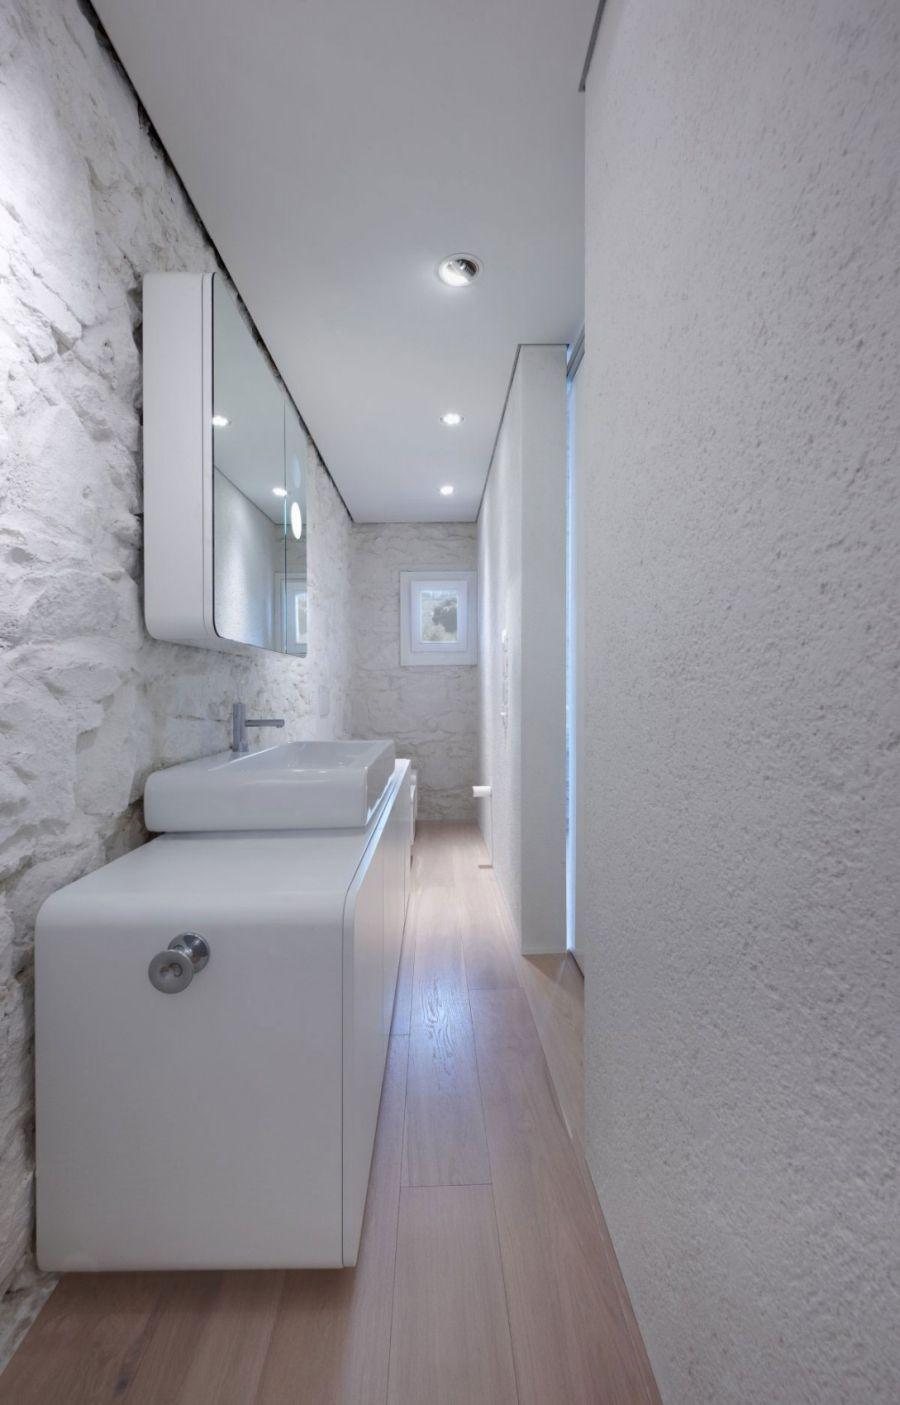 Mirrored shelves in the white bathroom